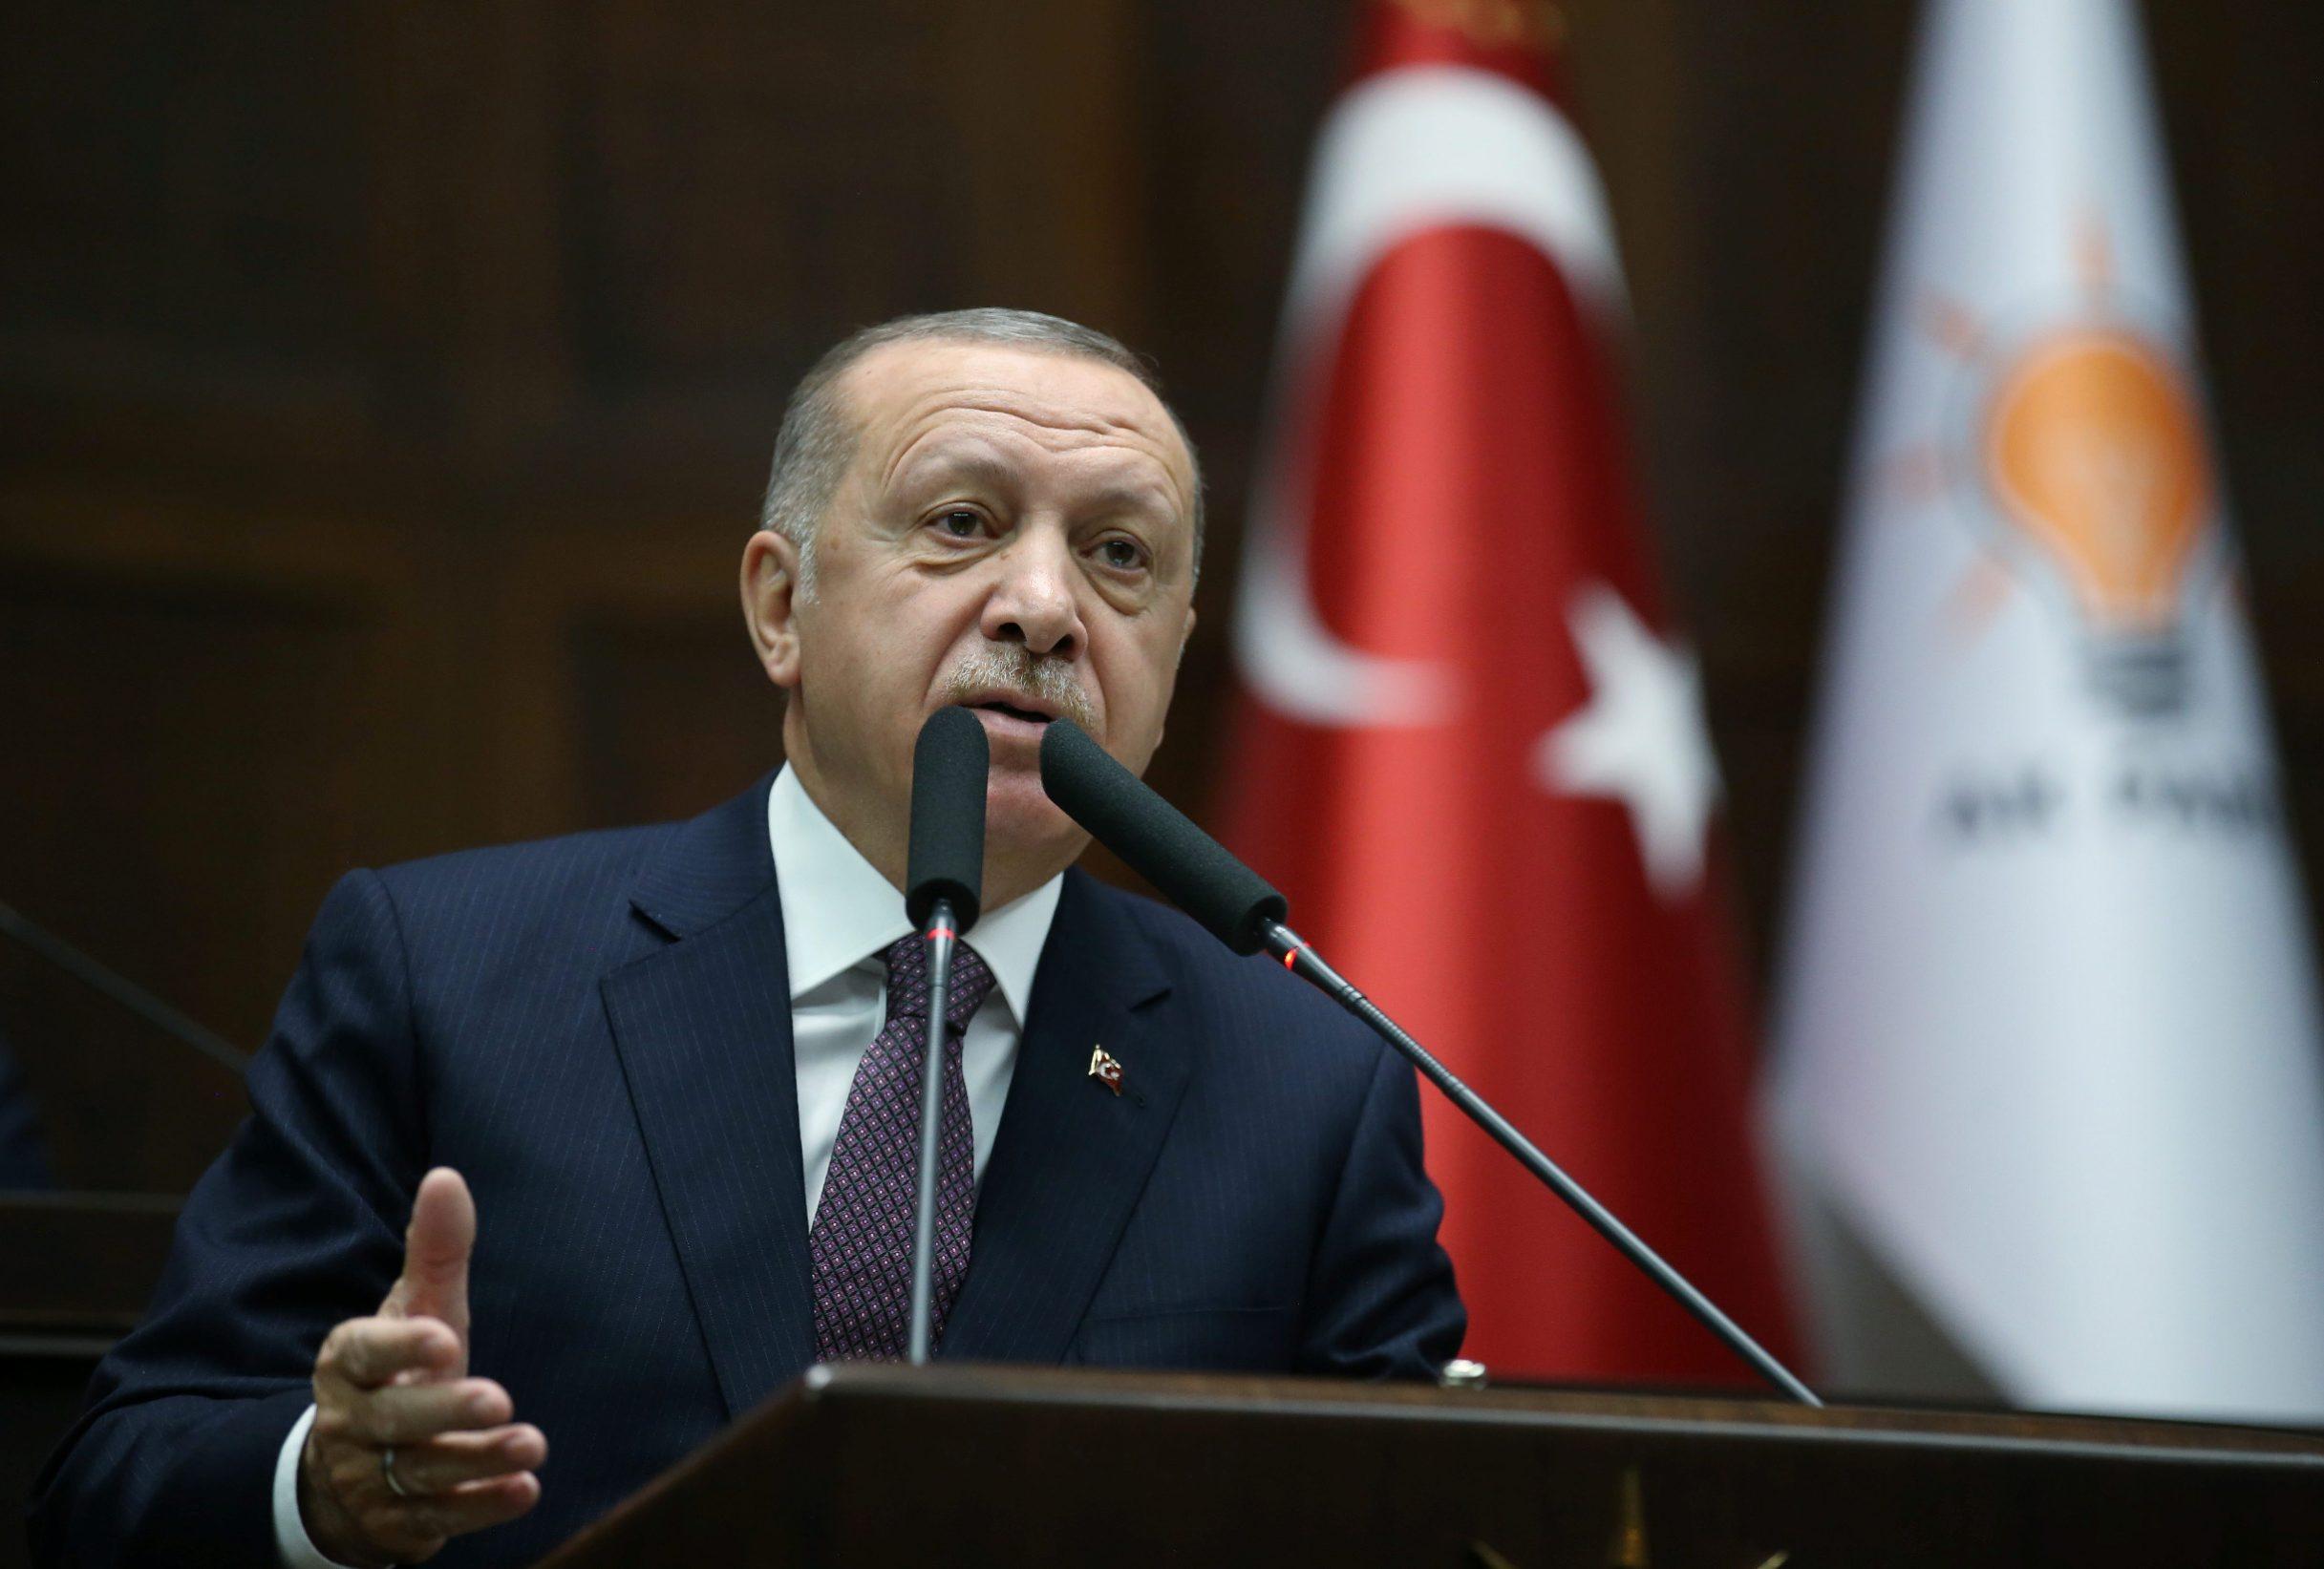 2019-11-26T101536Z_1748860167_RC2YID9GM1ZQ_RTRMADP_3_TURKEY-SECURITY-USA-ERDOGAN